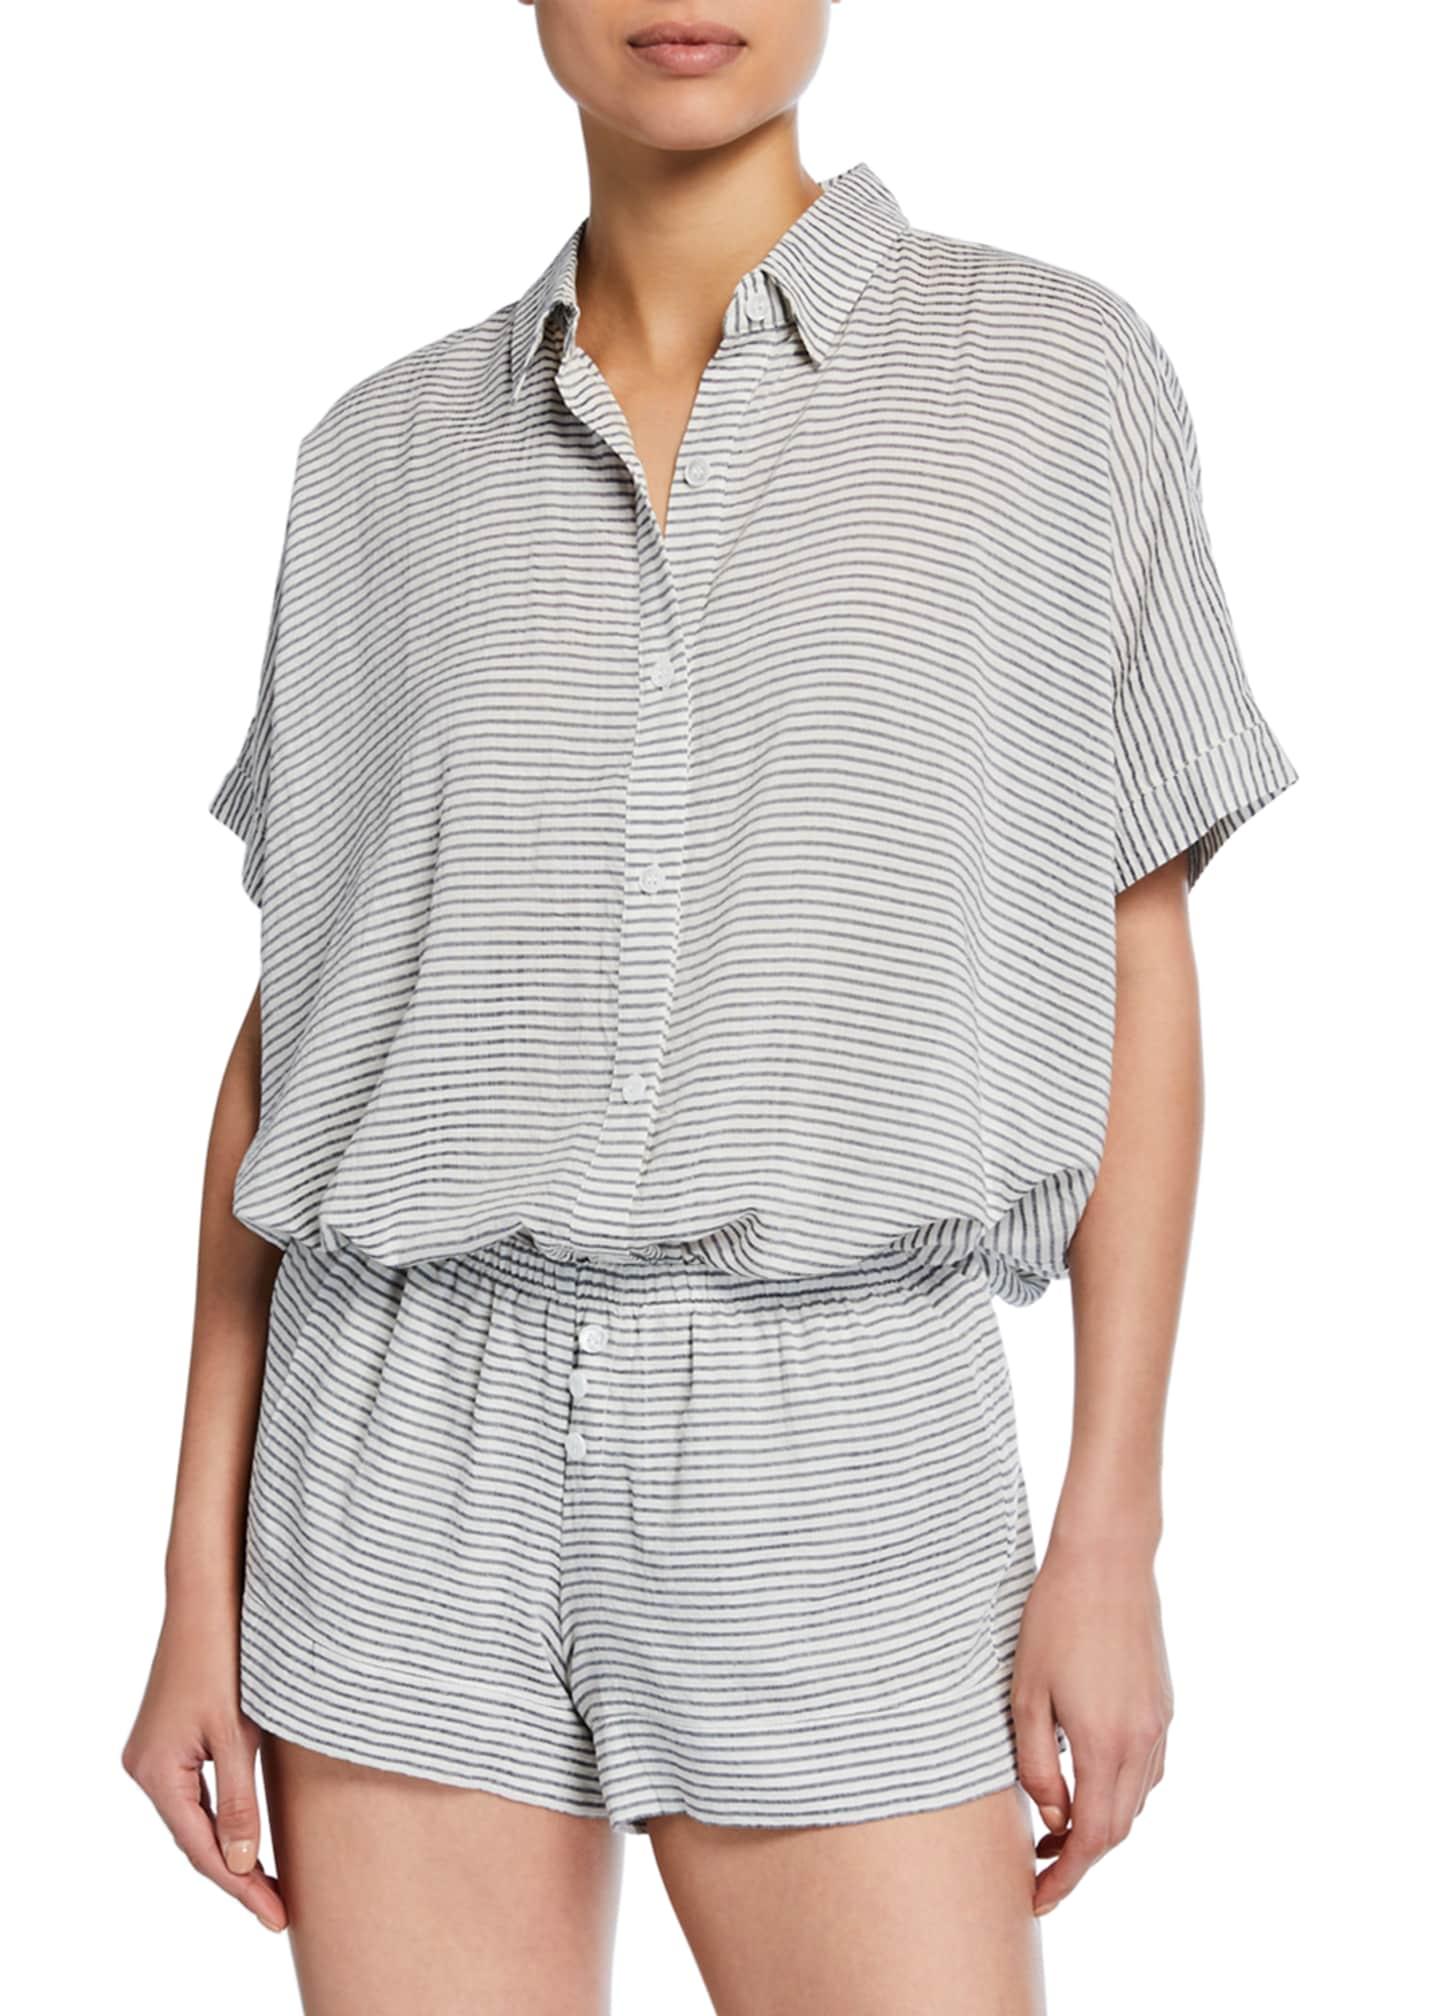 Eberjey Nautico Striped Shorty Pajama Set